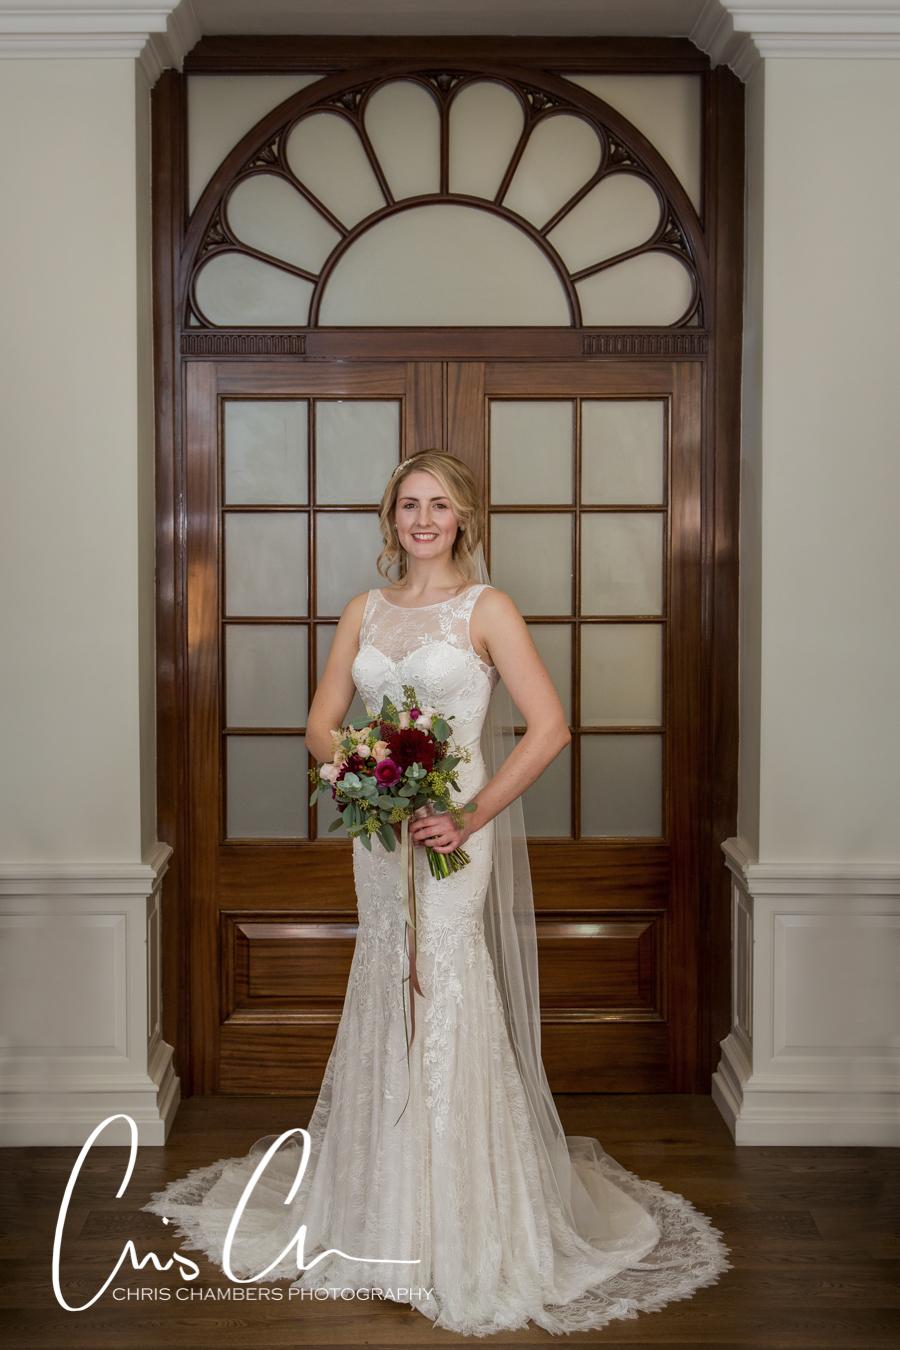 Denton Hall wedding photography, Denton Hall award winning wedding photographer, Ilkley wedding photographer, Leeds wedding photography